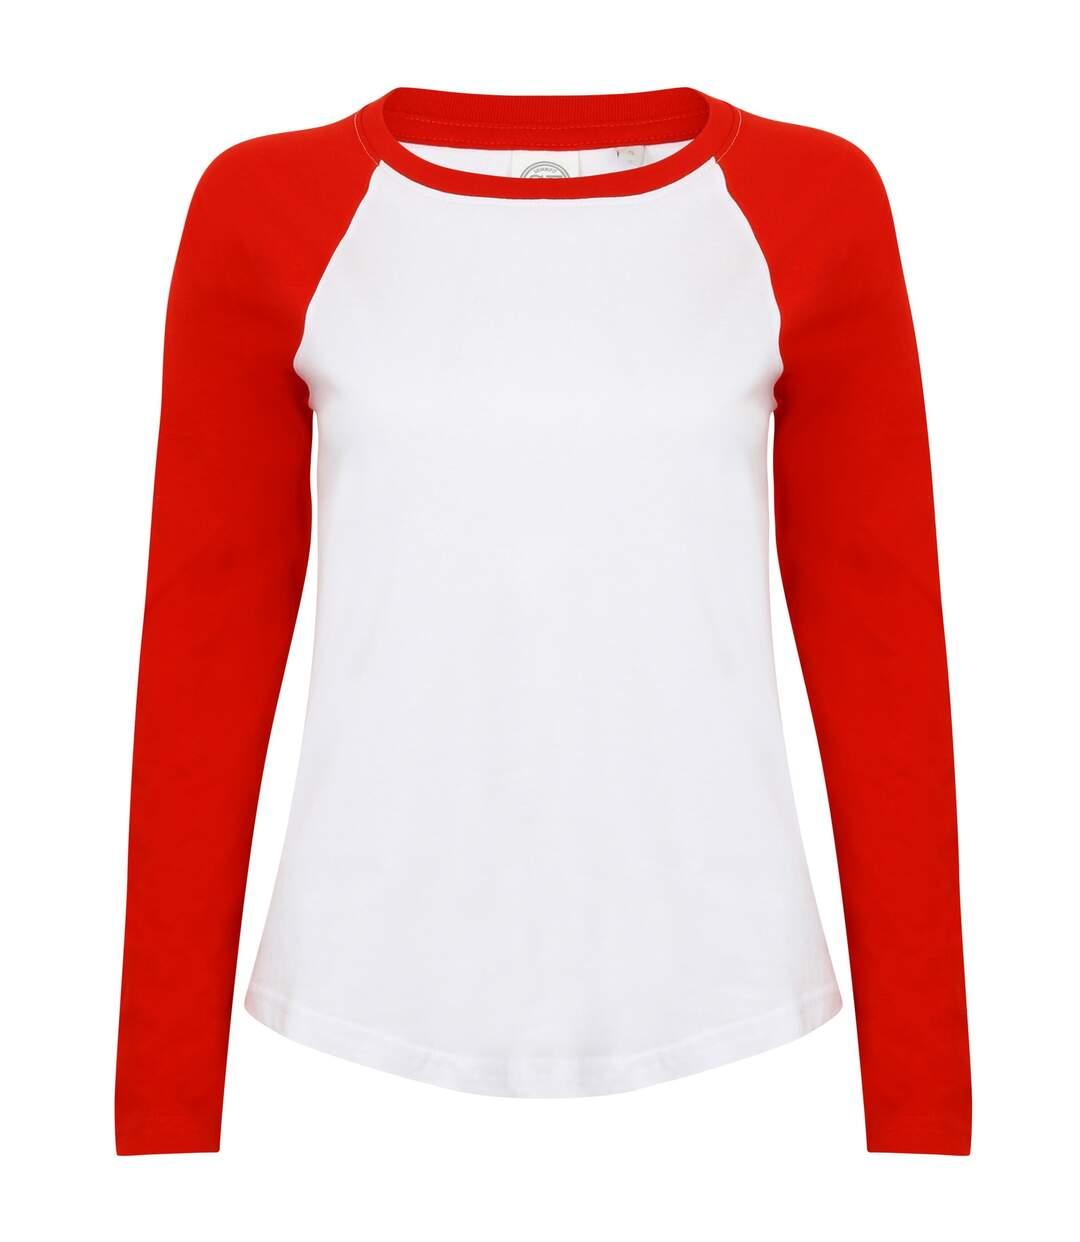 Skinni Fit - T-Shirt À Manches Longues - Femme (Blanc/Rouge) - UTRW4731